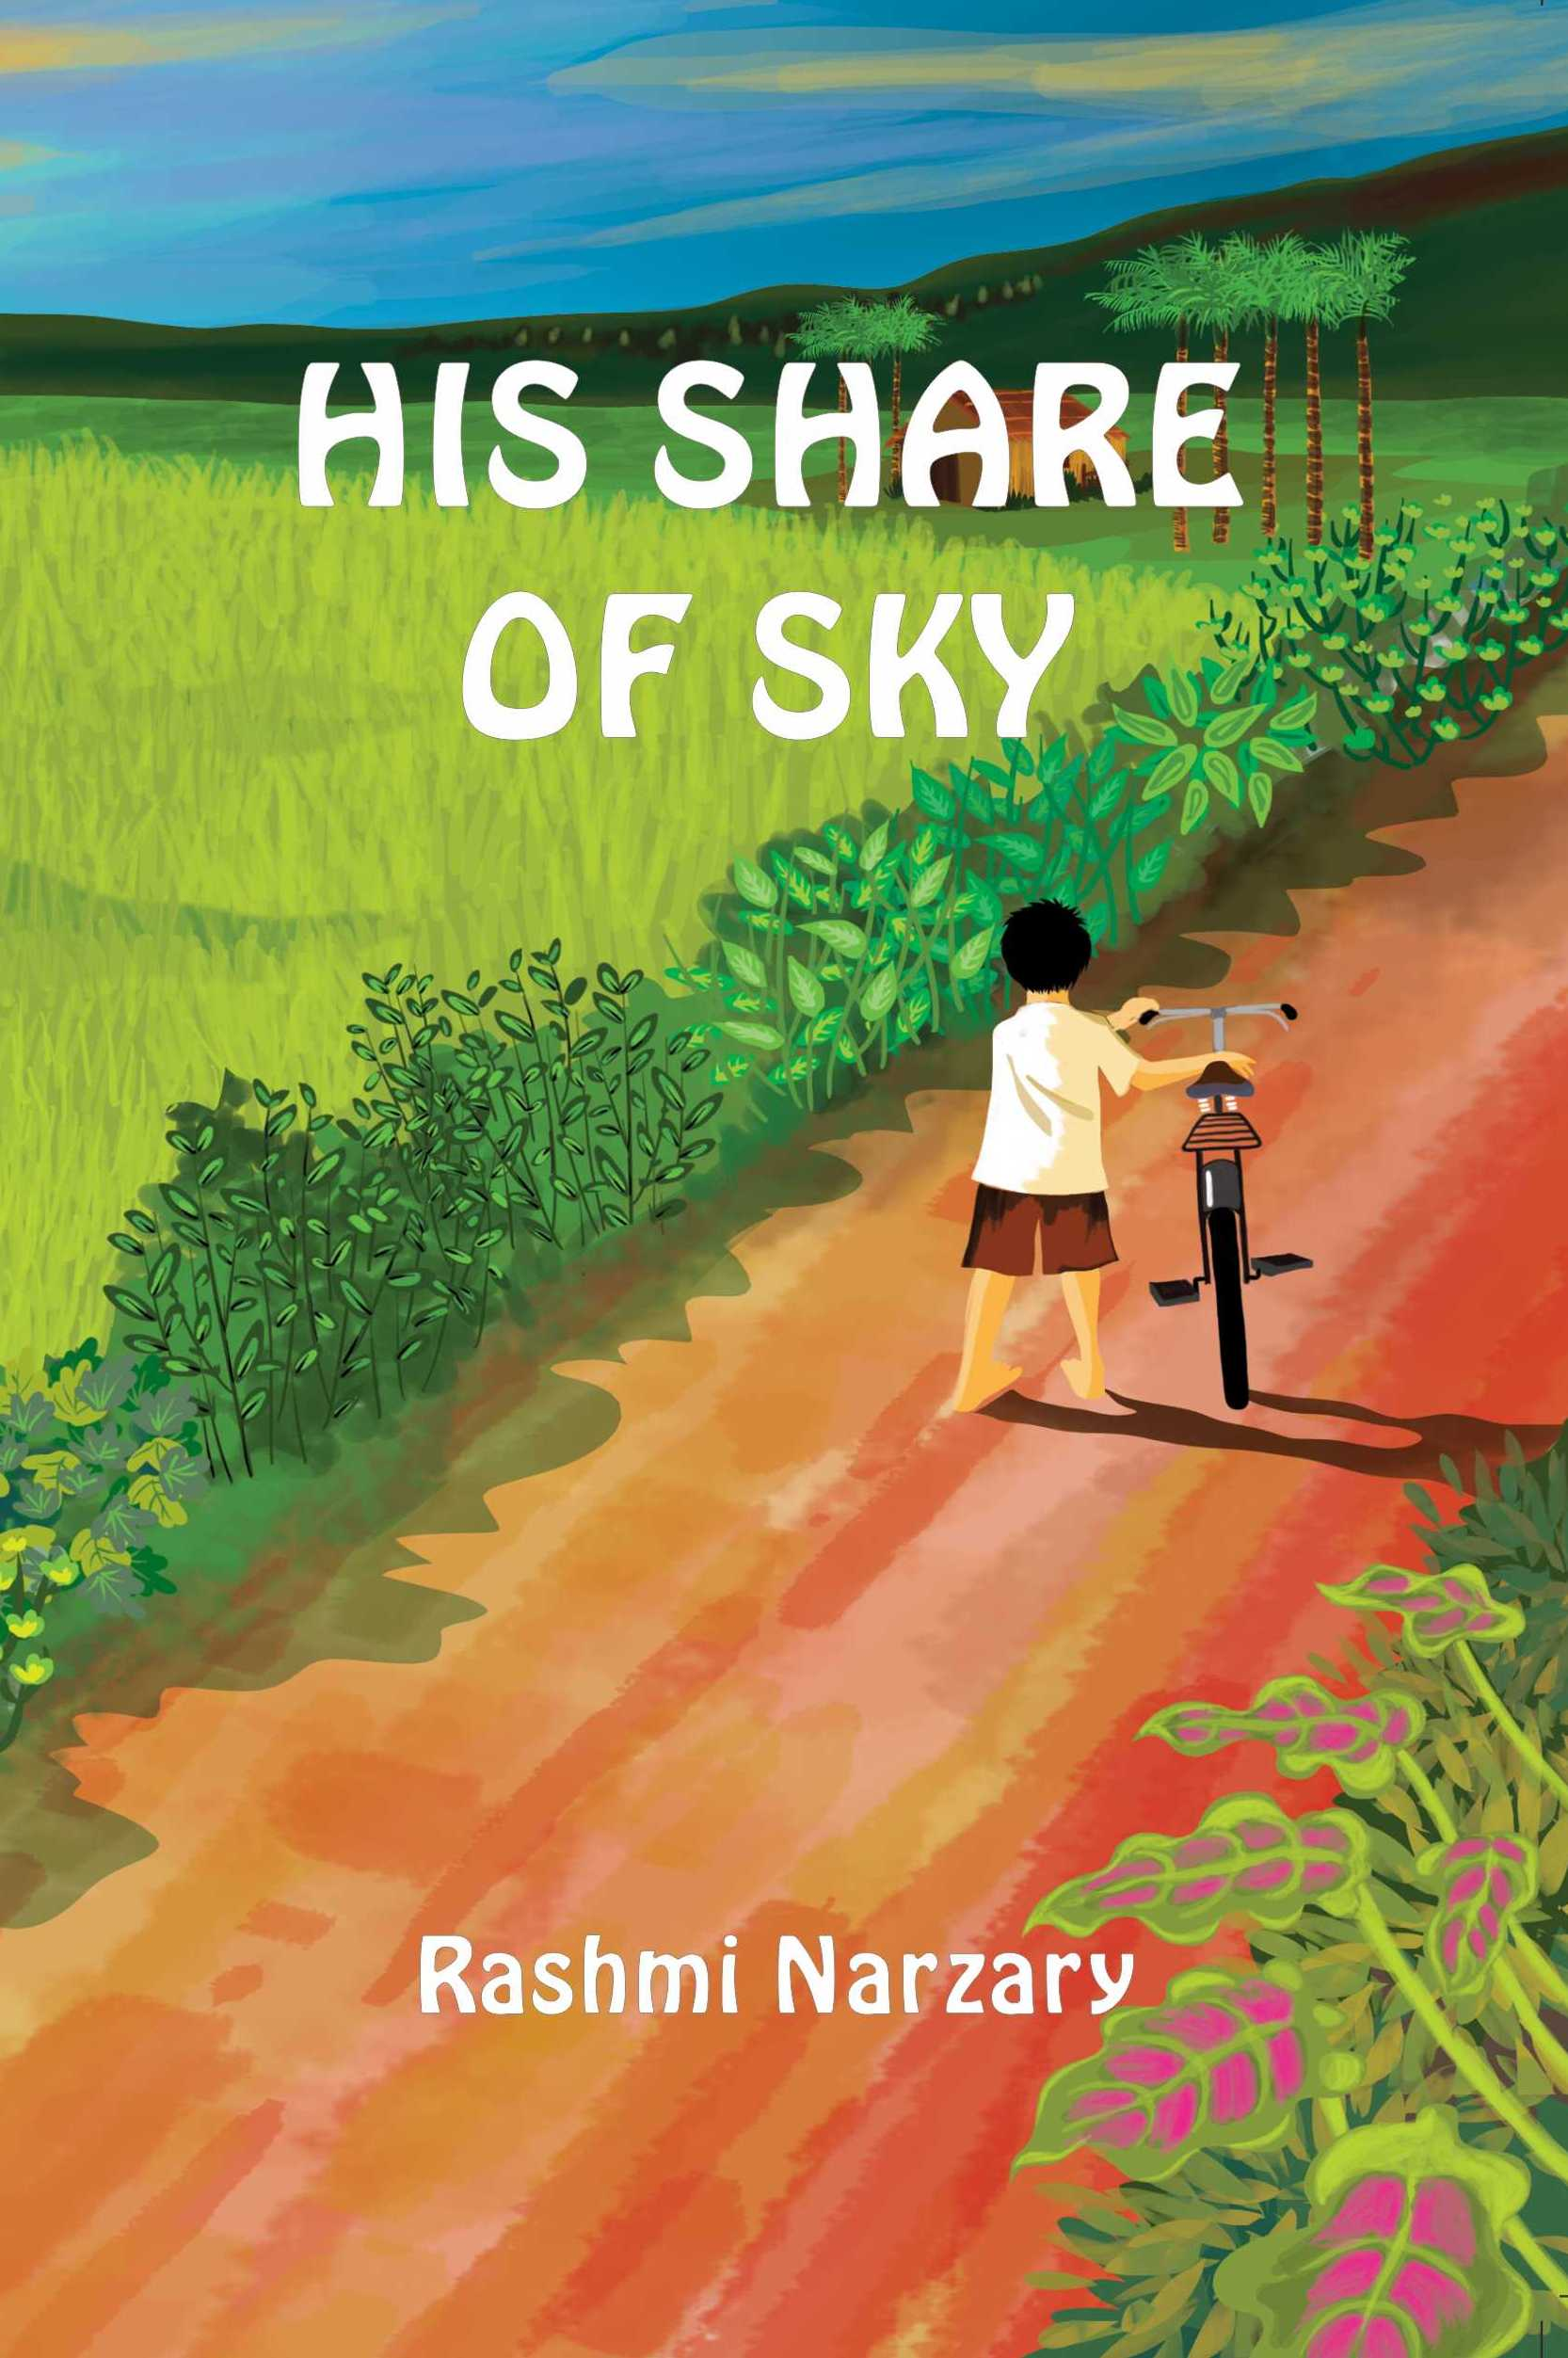 His Share Of Sky - Rashmi Narzary